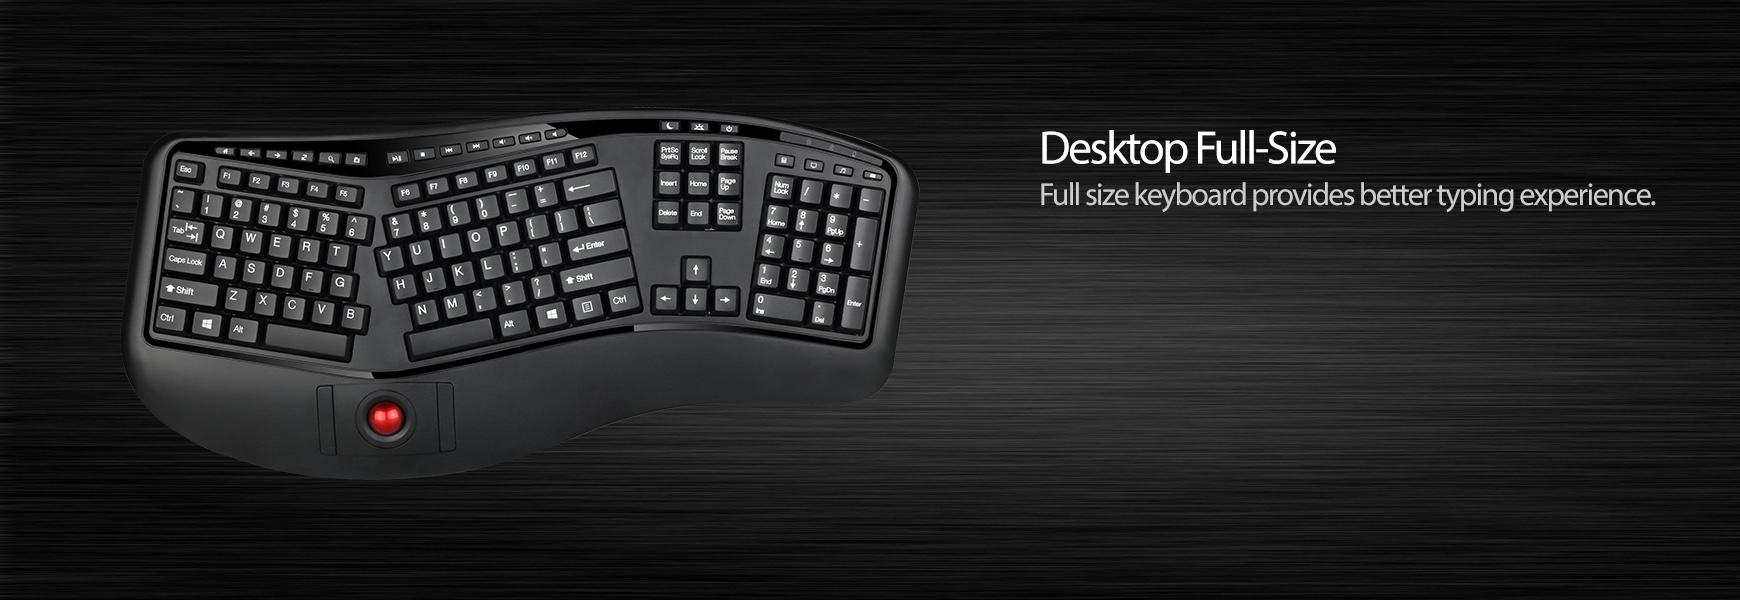 49a42dd55d7 Model Number: WKB-3500UB Categories: Ergonomic, Ergonomic Solutions,  Keyboards, Trackball Keyboards